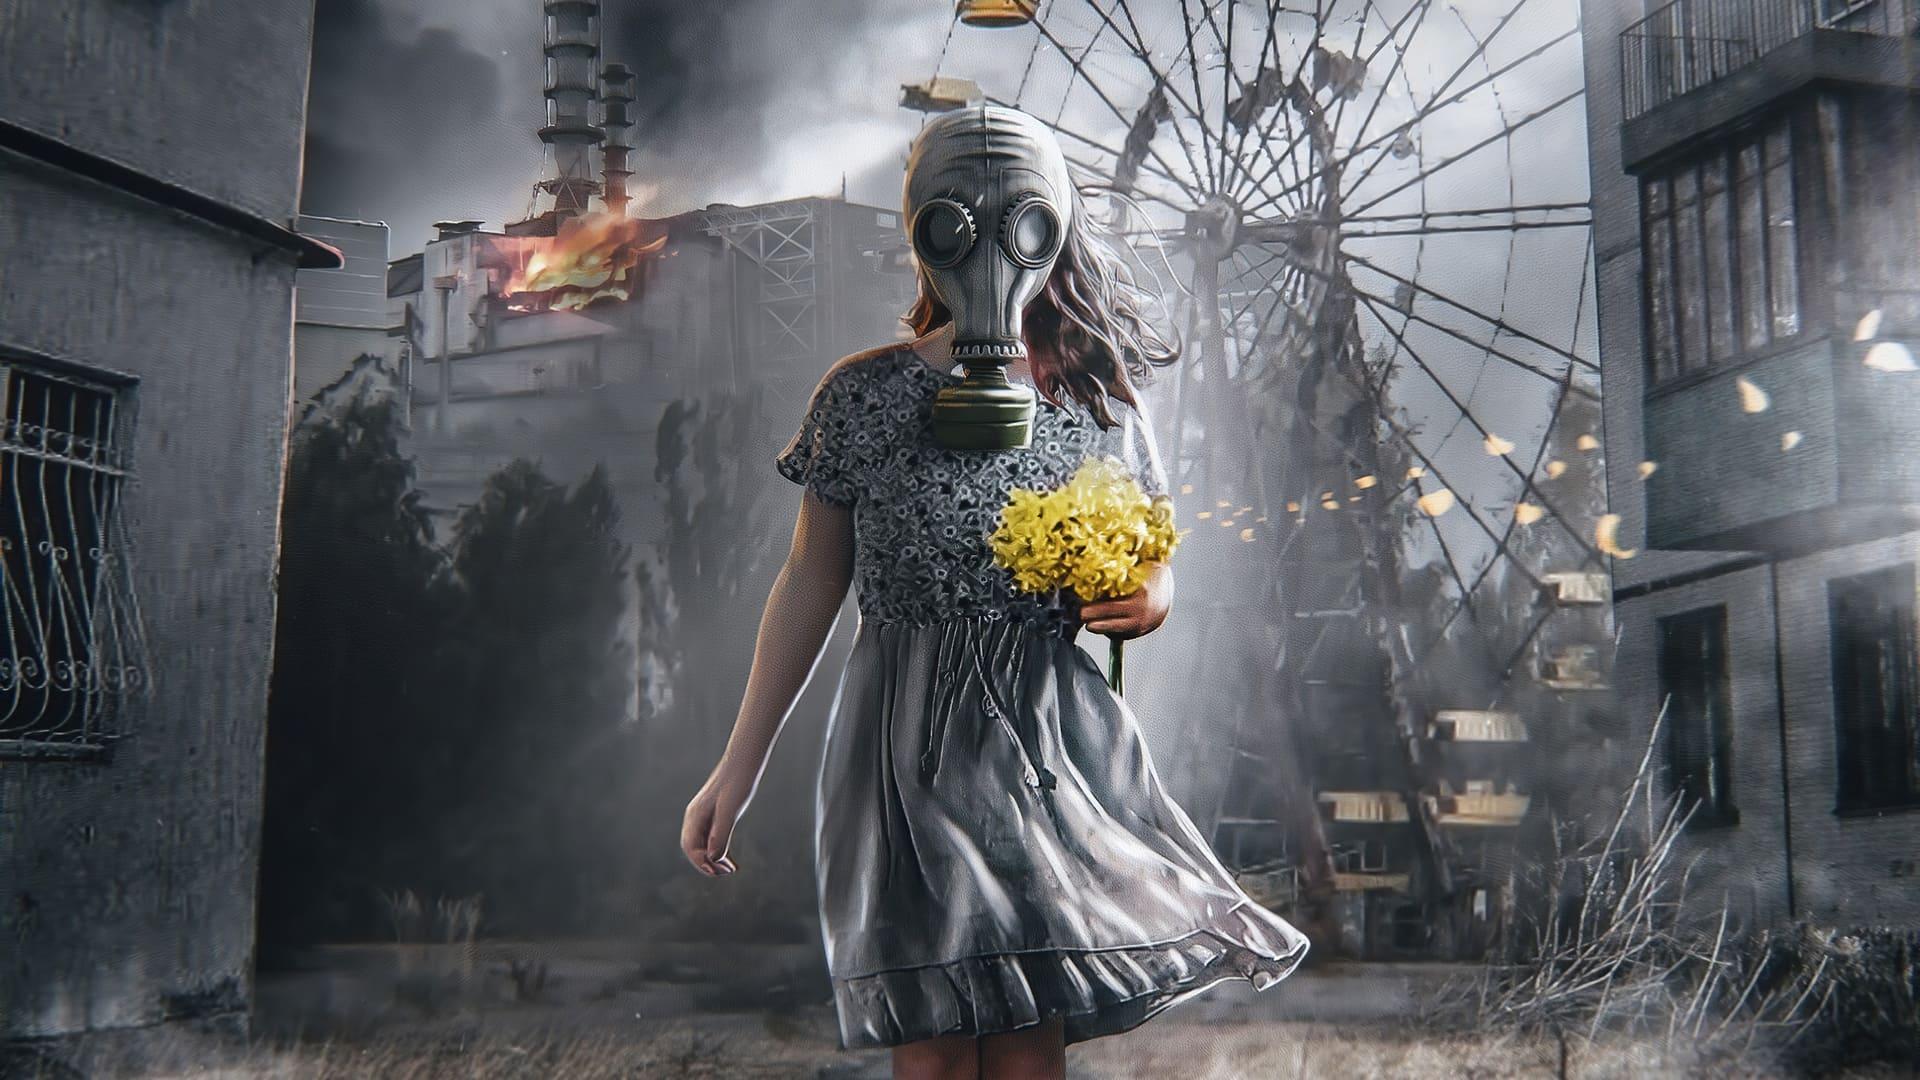 escape_room_vr_chernobyl_1